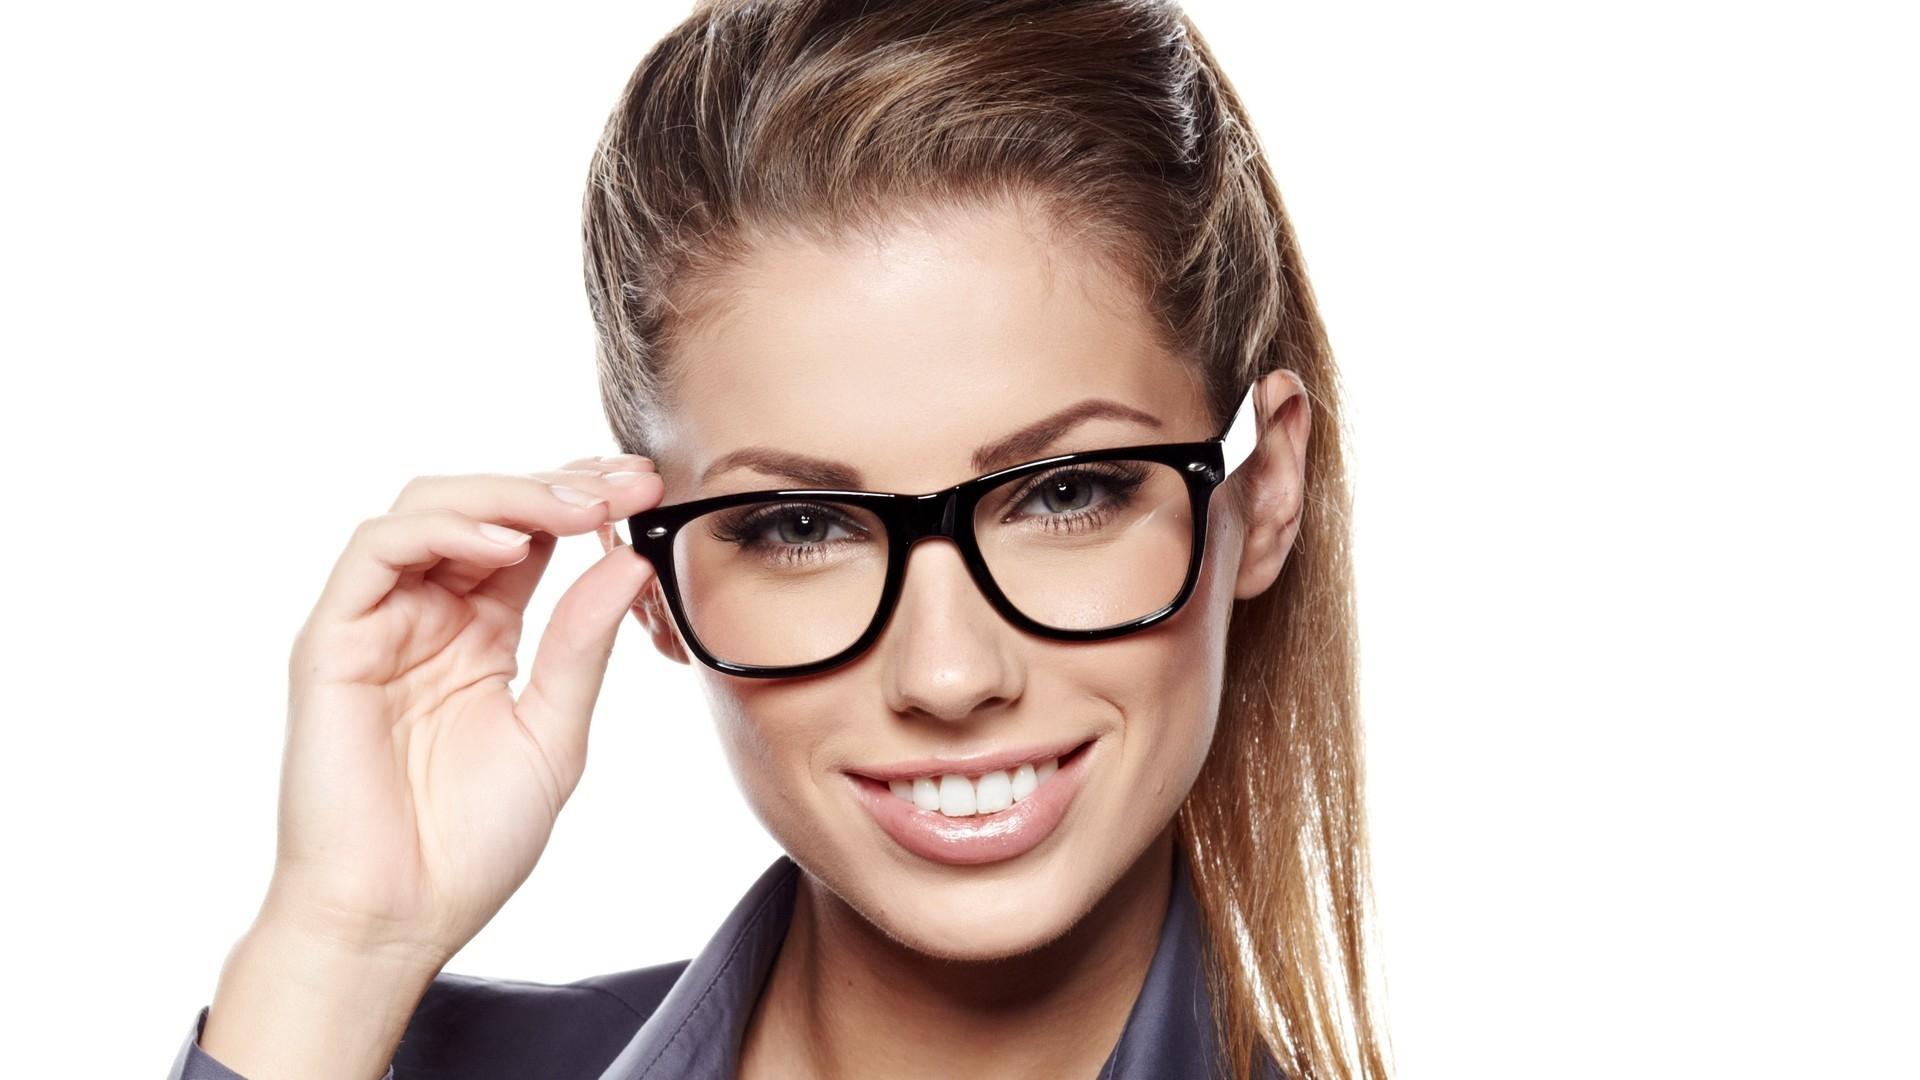 Fantastic Girl Glasses Wallpaper